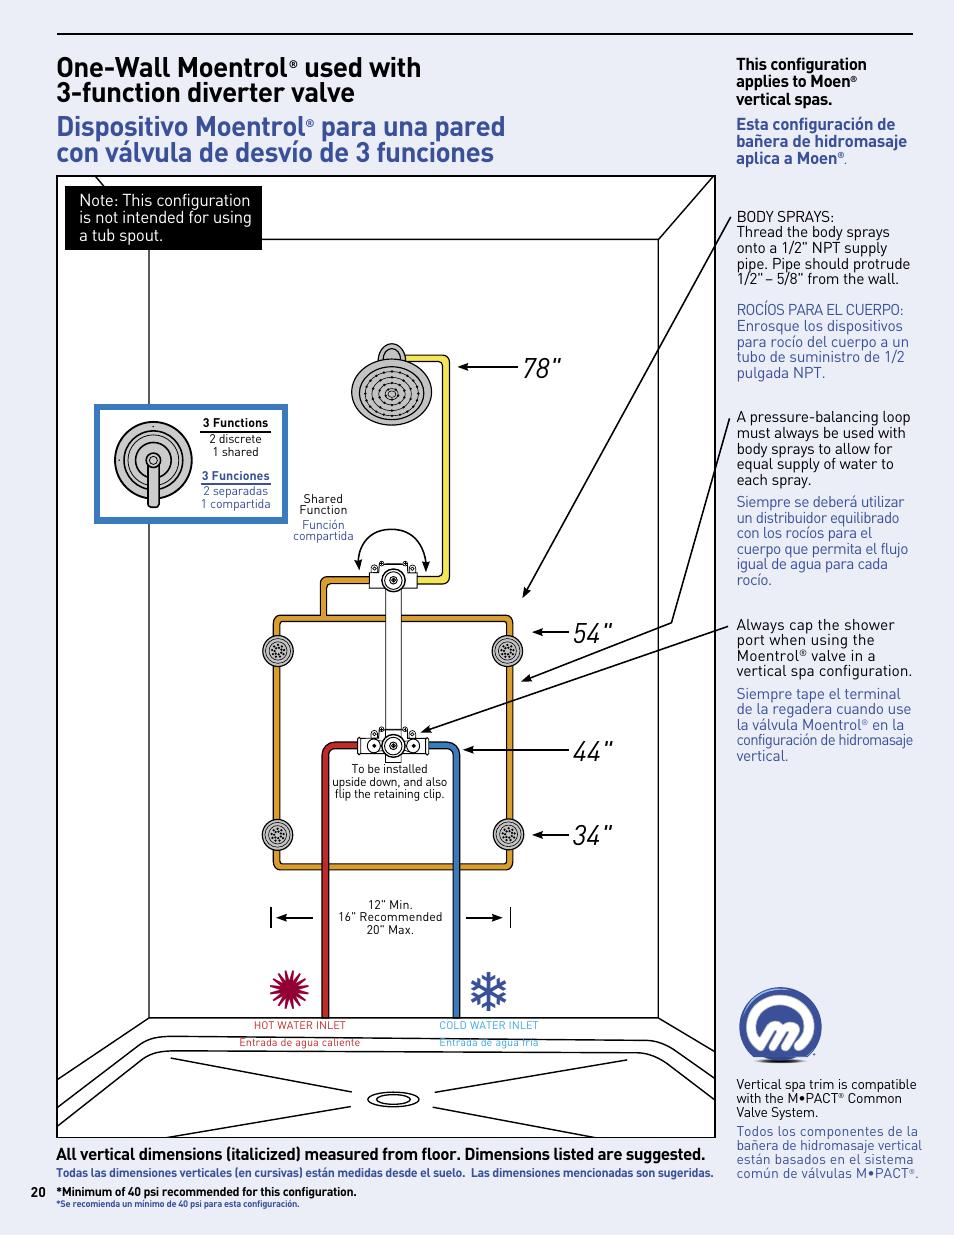 One Wall Moentrol Moen Vertical Spa Mf2816 User Manual Page 20